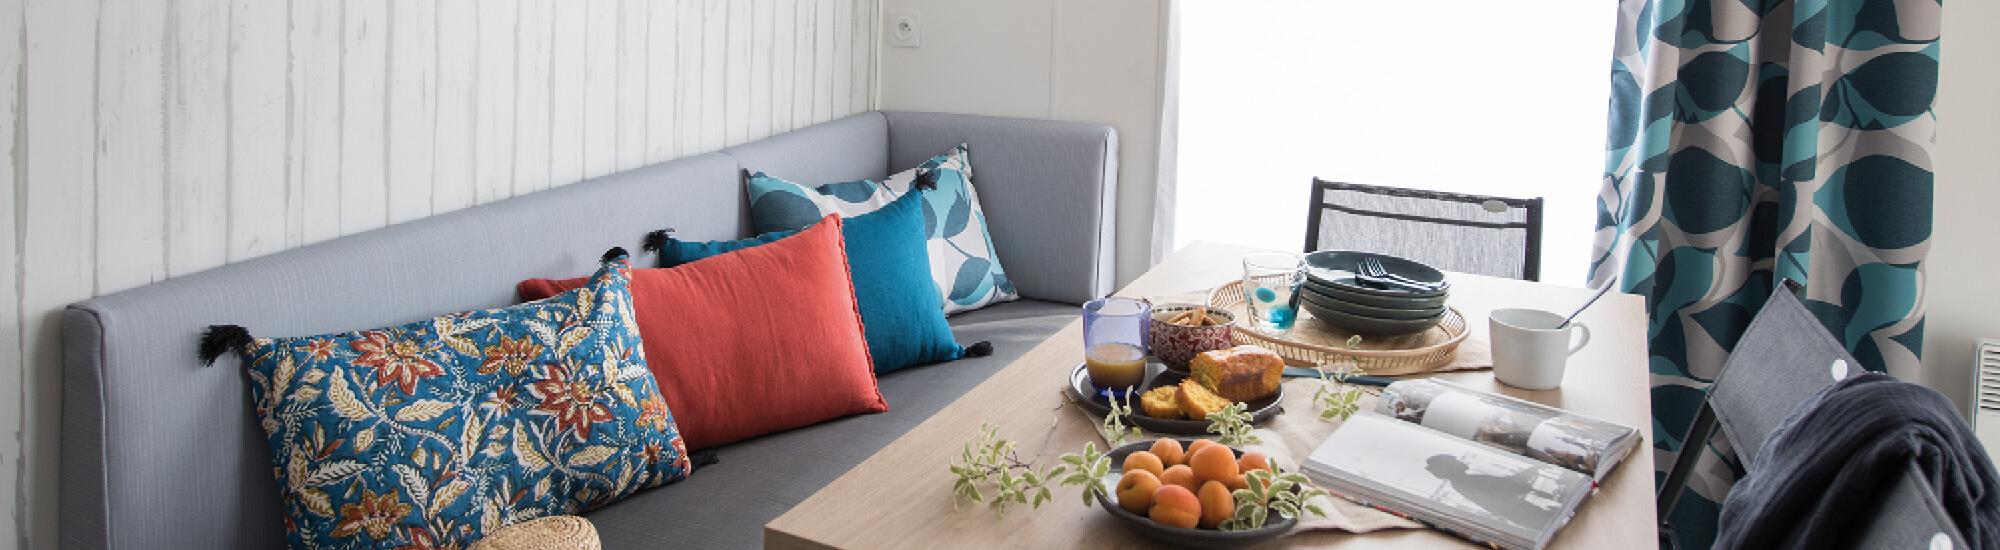 mobil homes 3 chambres bahiatrio mobil home rideau. Black Bedroom Furniture Sets. Home Design Ideas